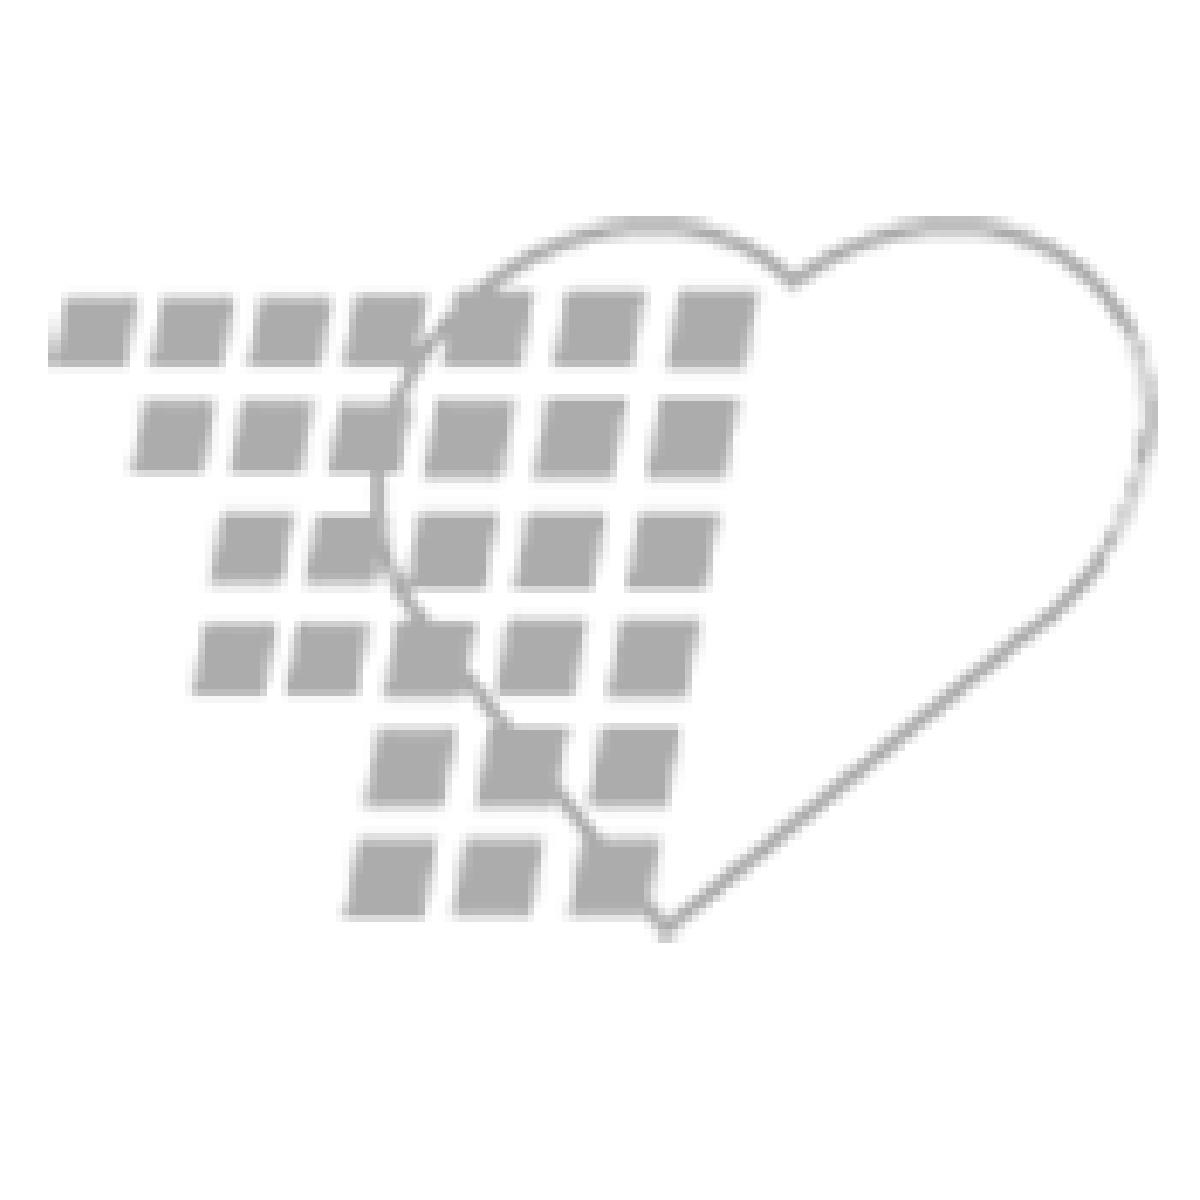 09-83-1703 Laerdal SkillGuide (New)